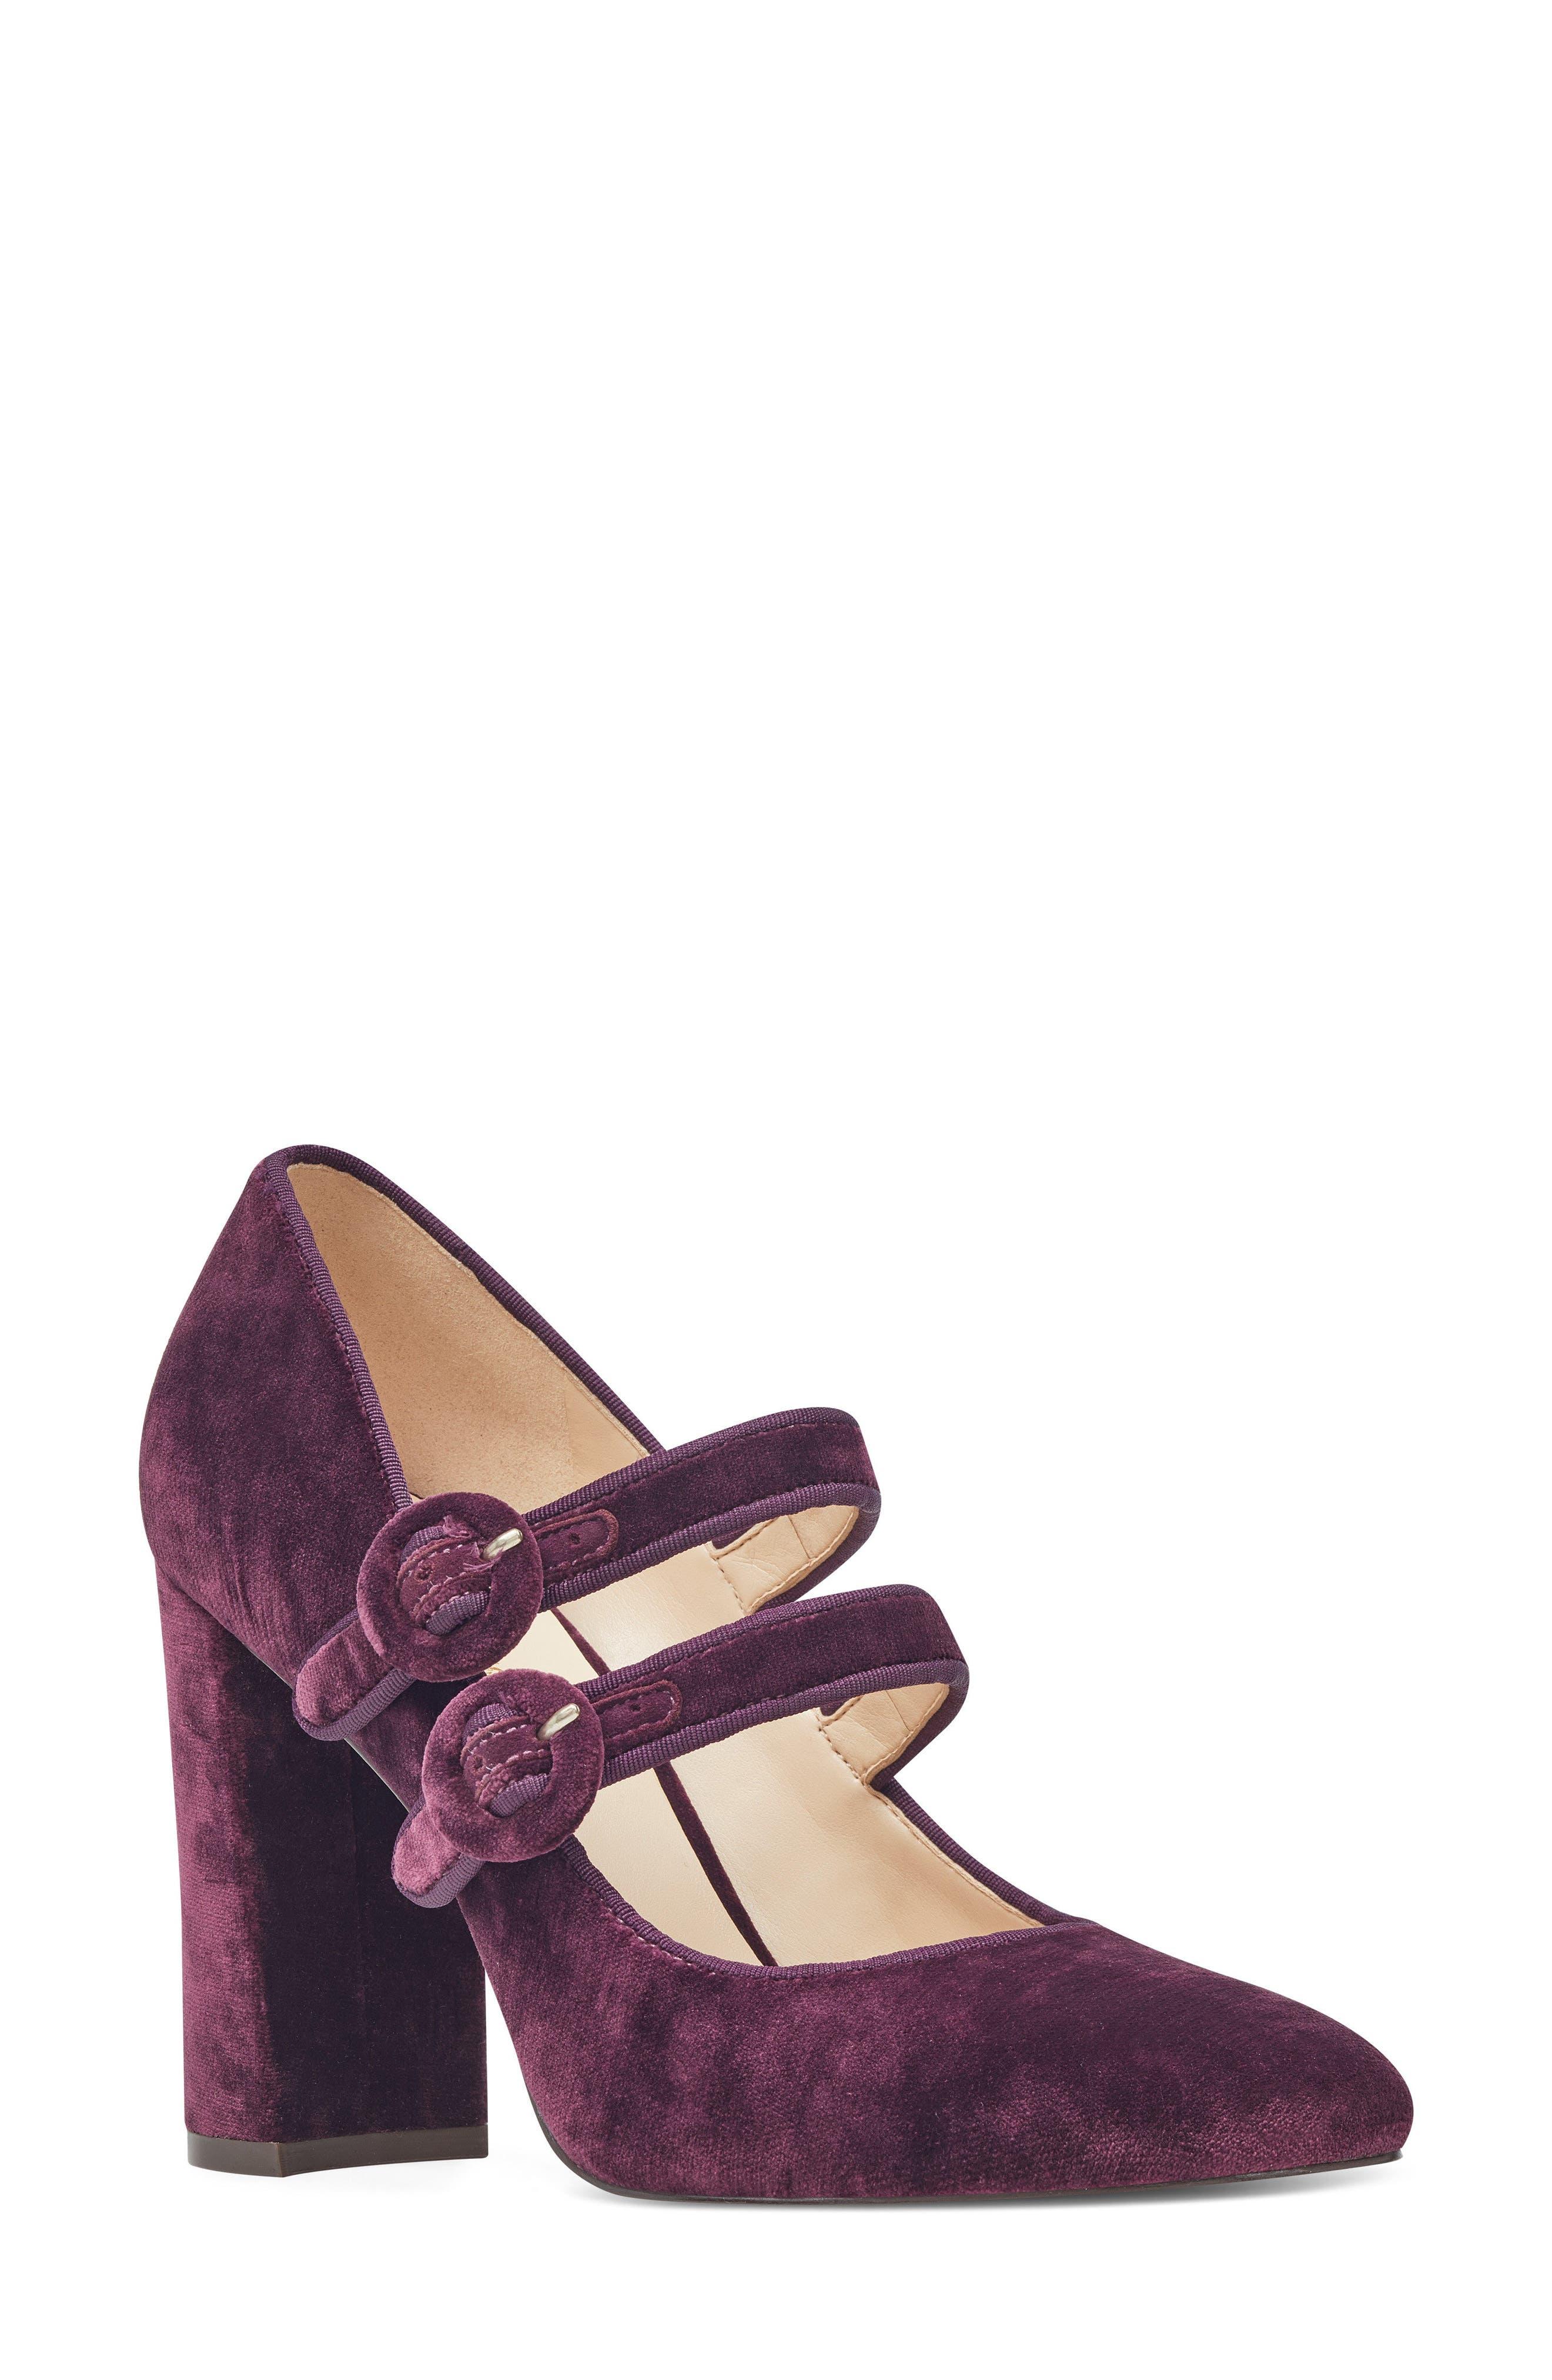 Dabney Double Strap Mary Jane Pump,                             Main thumbnail 1, color,                             Dark Purple Fabric